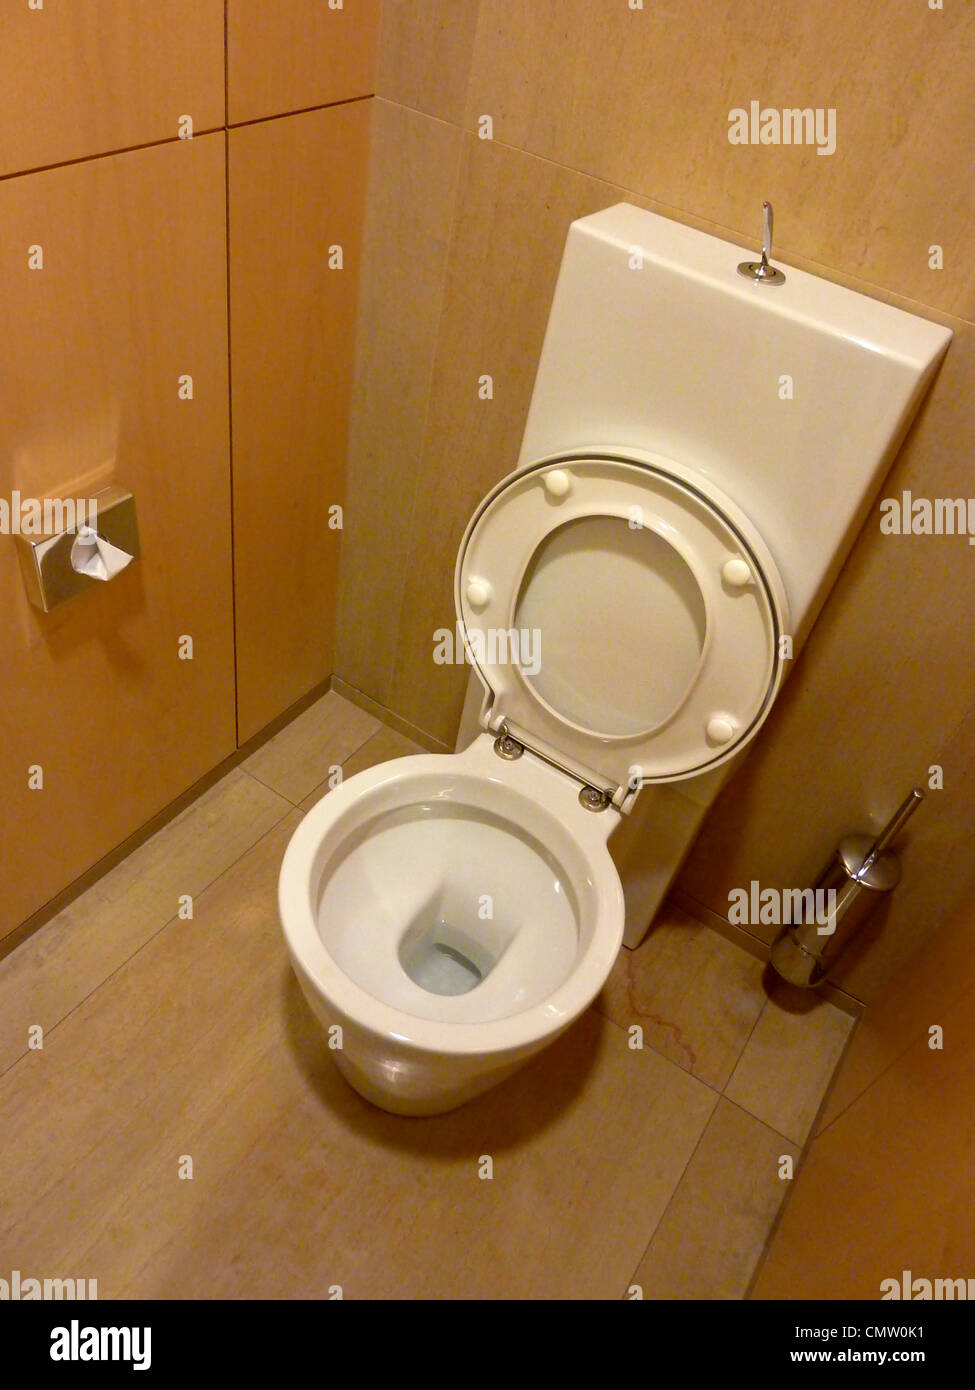 Bathroom Bath Toilet Loo Toilets Stock Photos & Bathroom Bath Toilet ...